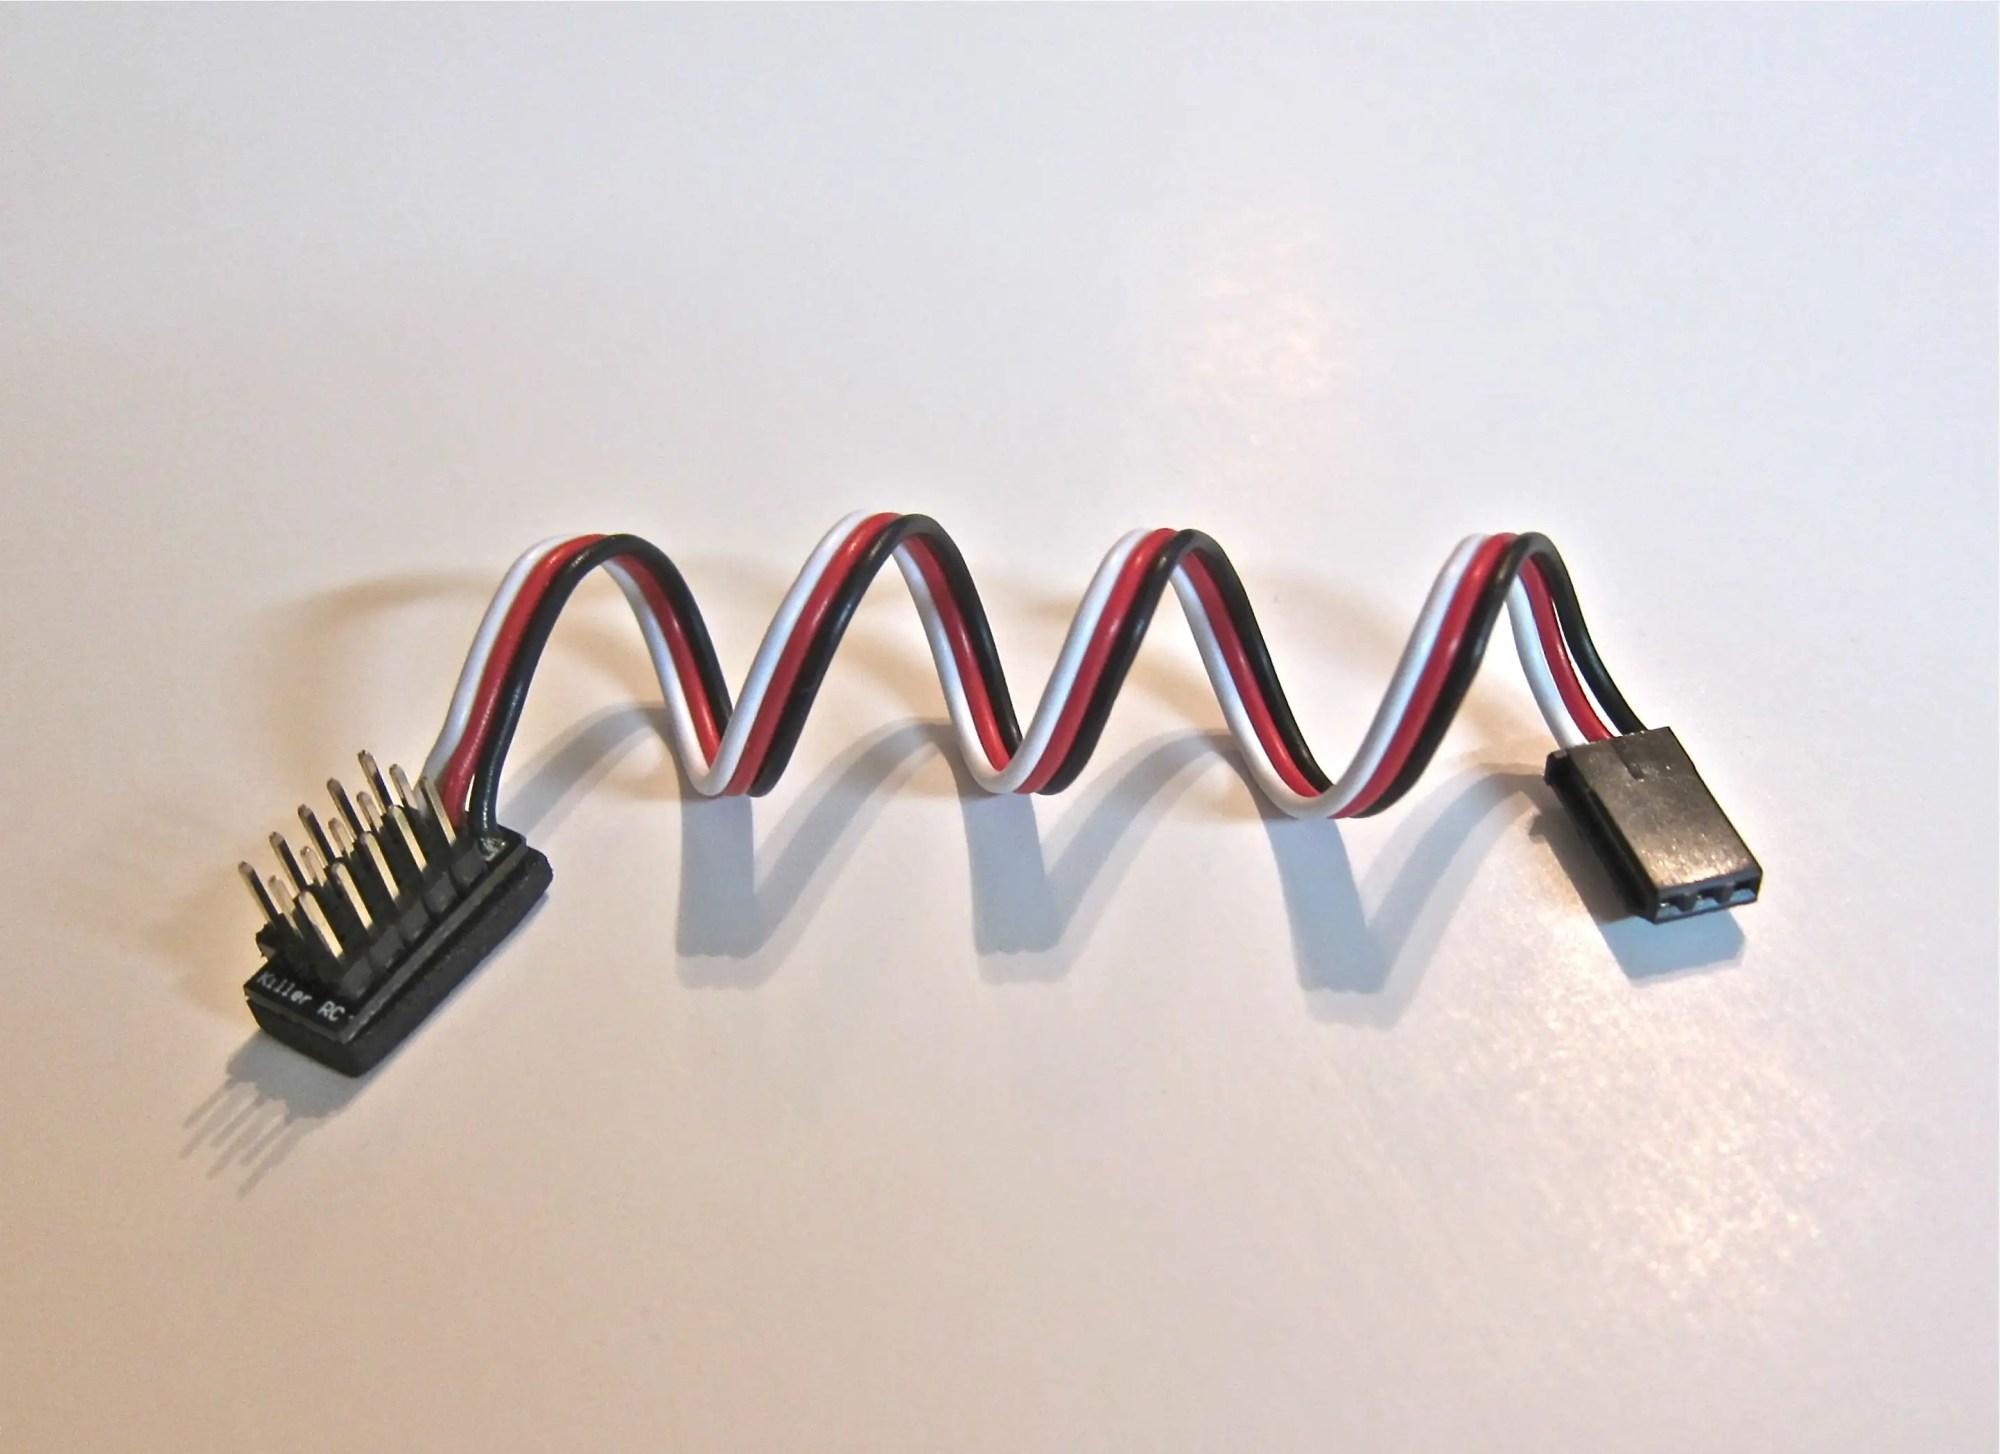 hight resolution of cut a notch in bottom of batt box divider for wiring to run under